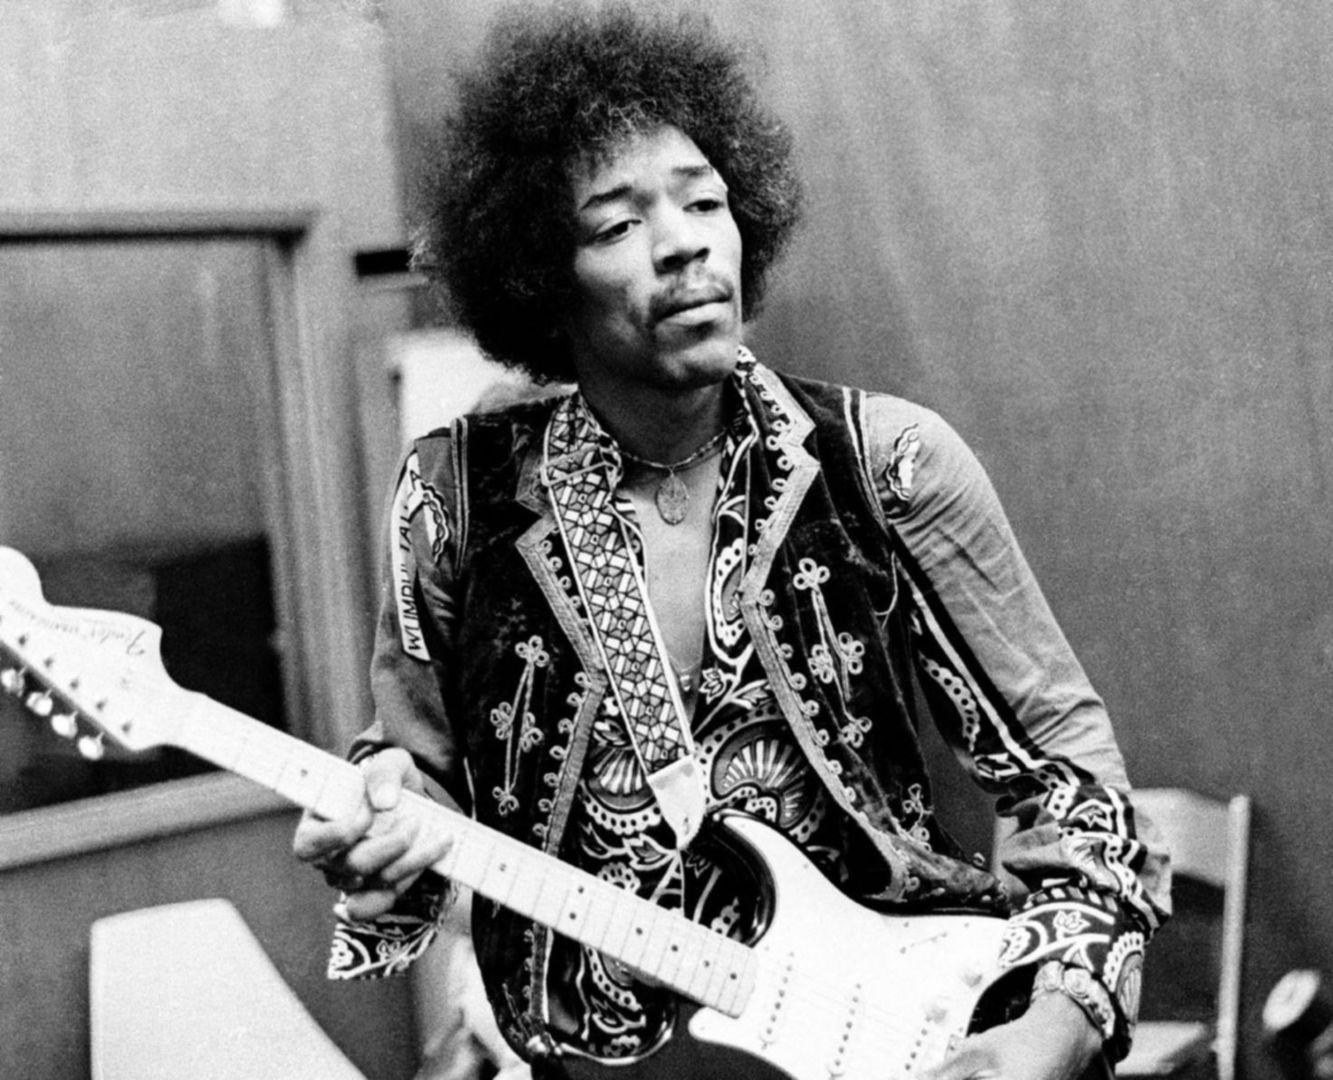 Jimmy Hendrix 100 beste gitarristen